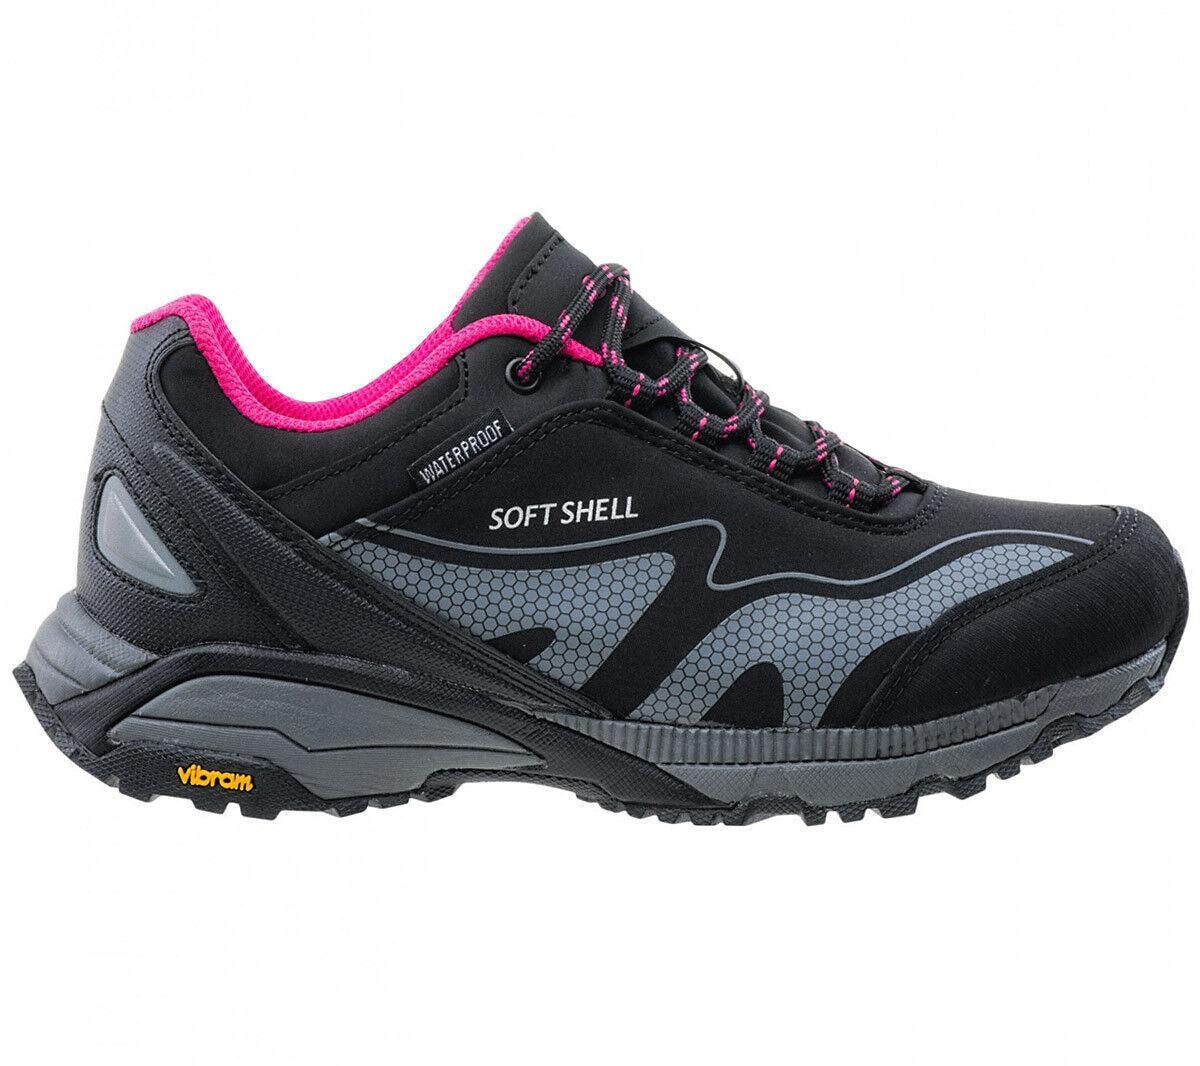 Hi-Tec Kangri Low Wp Softshell Vibram shoes Women's Hiking Outdoor Mountain